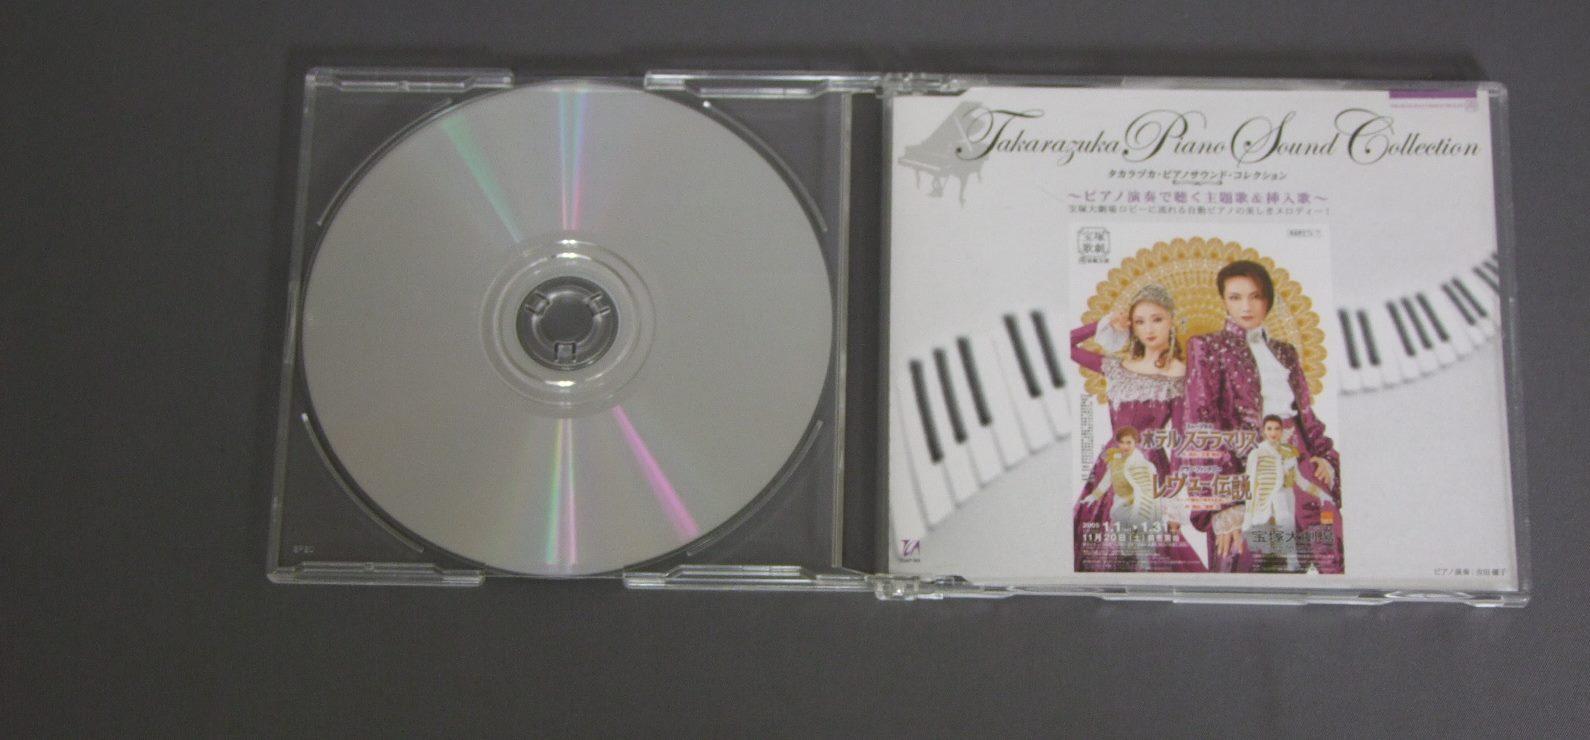 TAKARAZUKA PIANO SOUND COLLECTION - TAKARAZUKA PIANO SOUND COLLECTION - CD